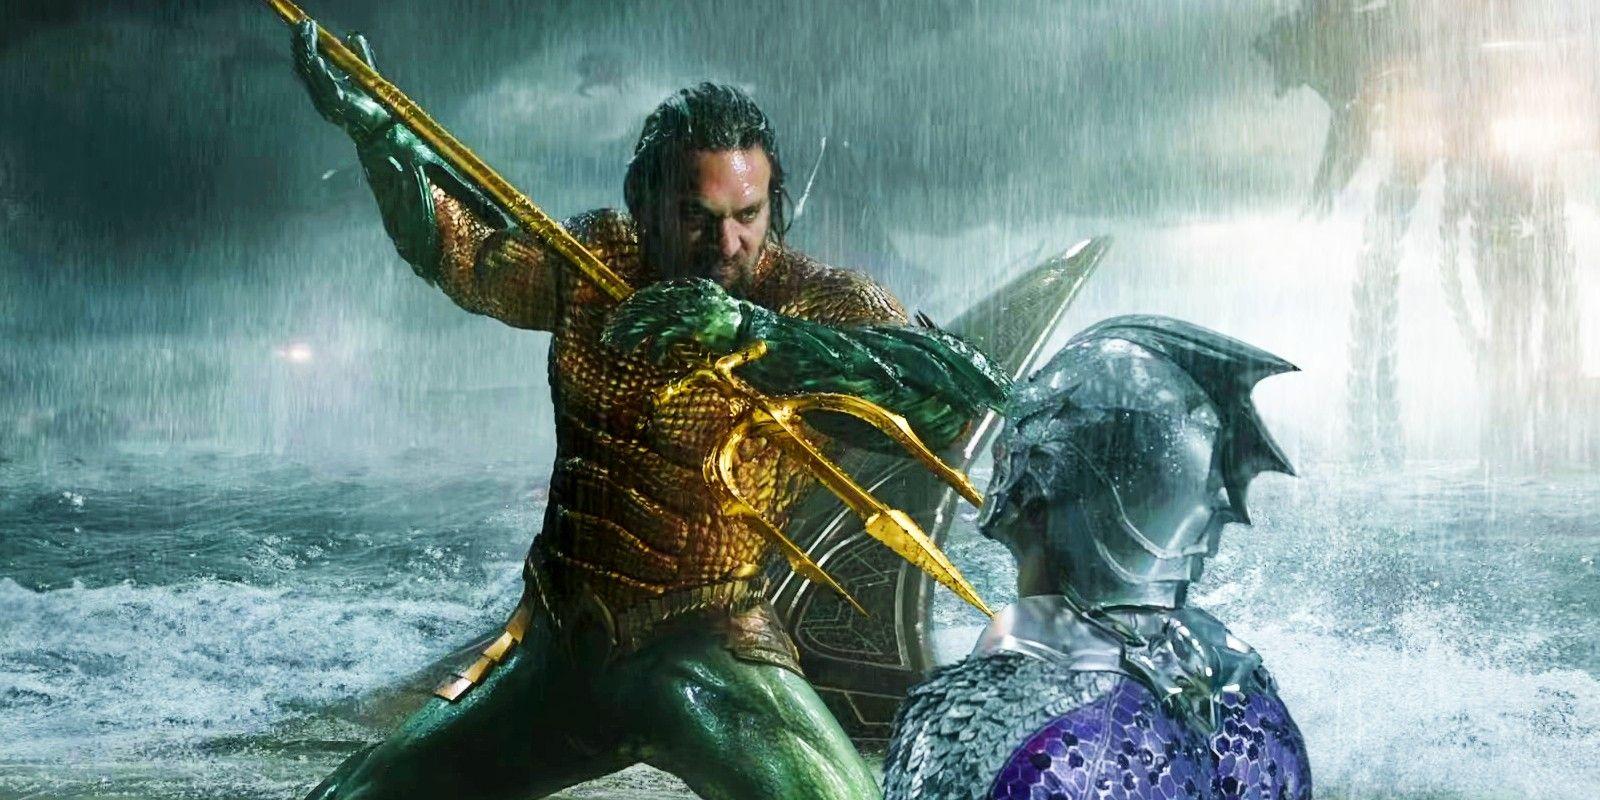 Aquaman 2 Starts Filming in July, Confirms Jason Momoa